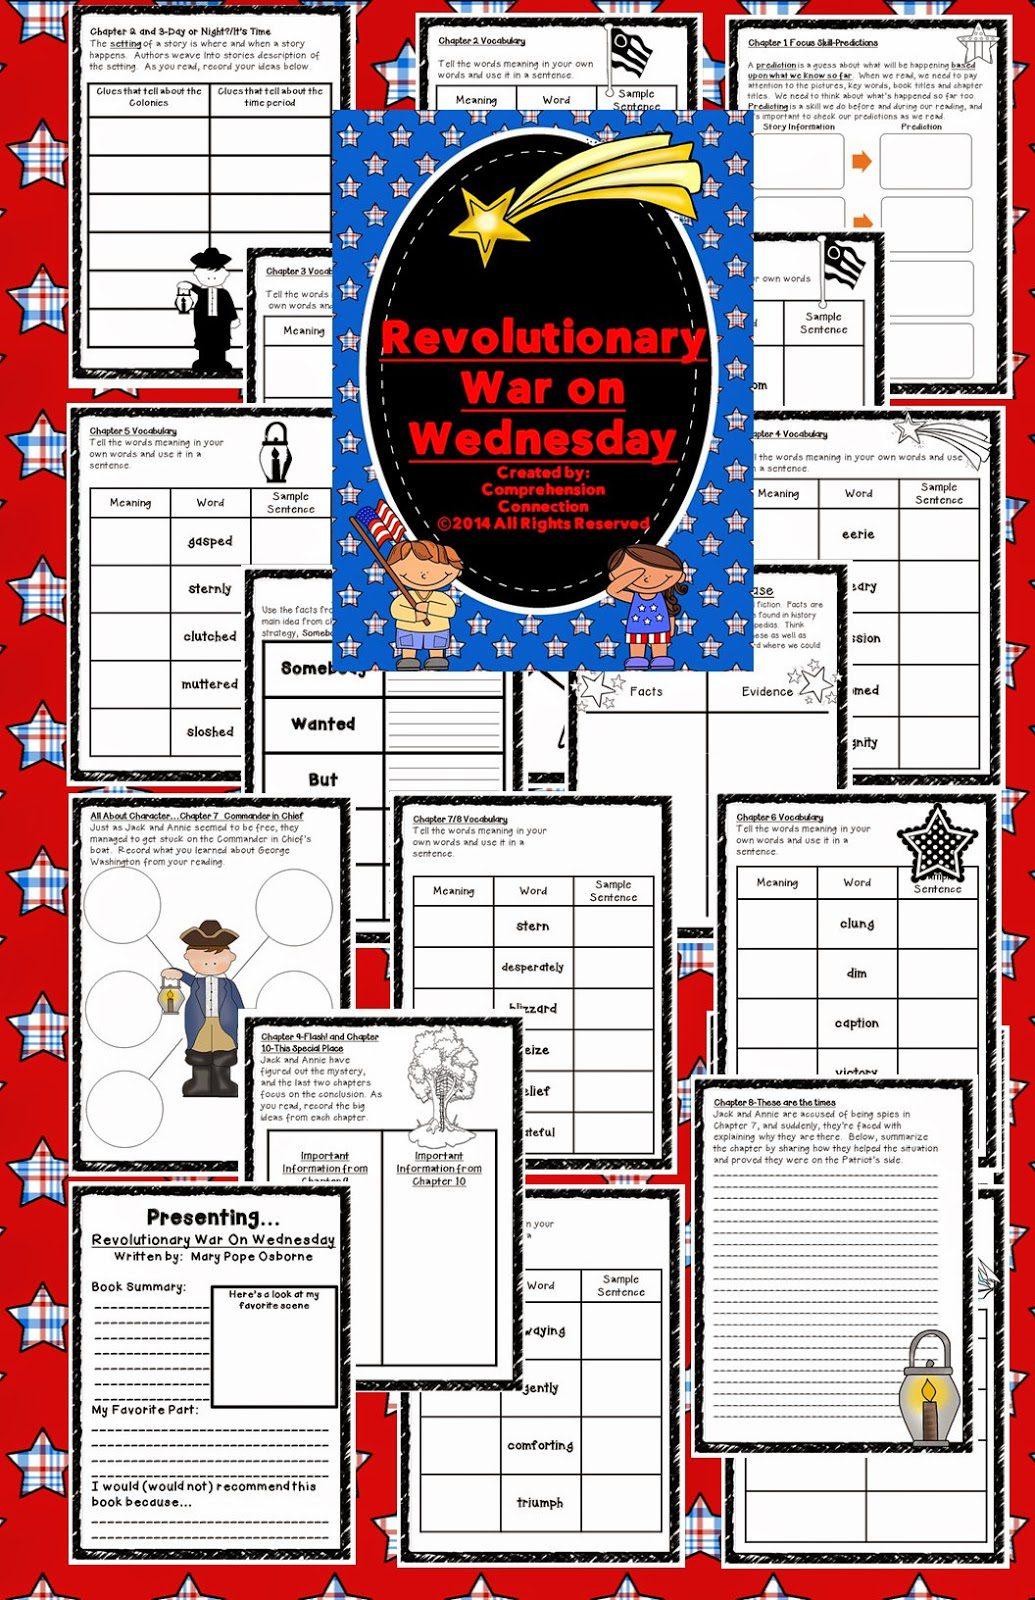 revolutionary2bwar2bon2bwednesday2bpreview-2618008